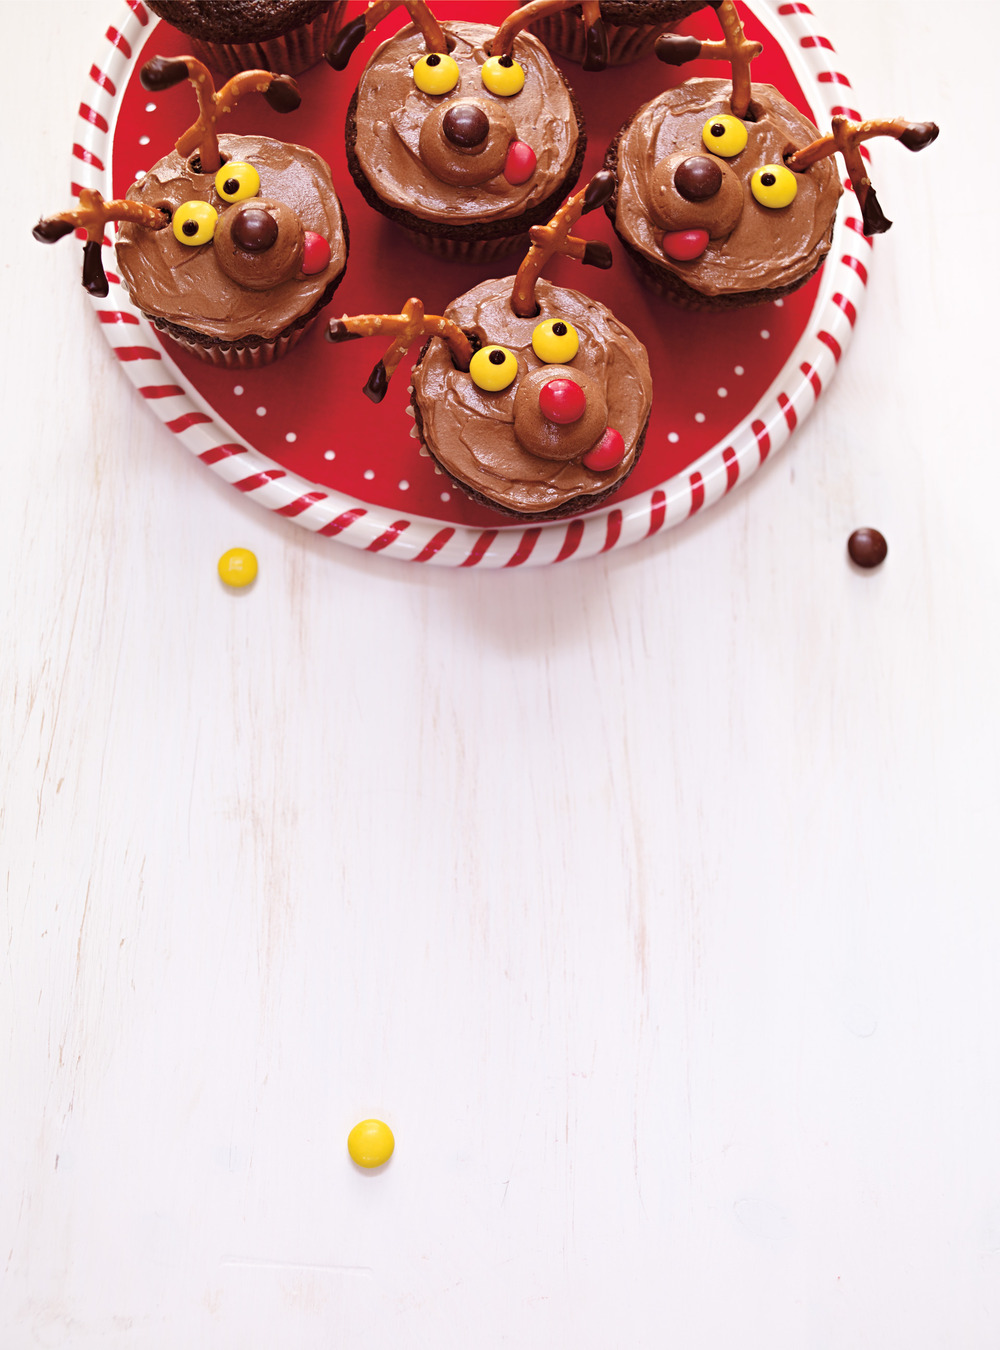 Cupcakes rennes au chocolat | ricardo